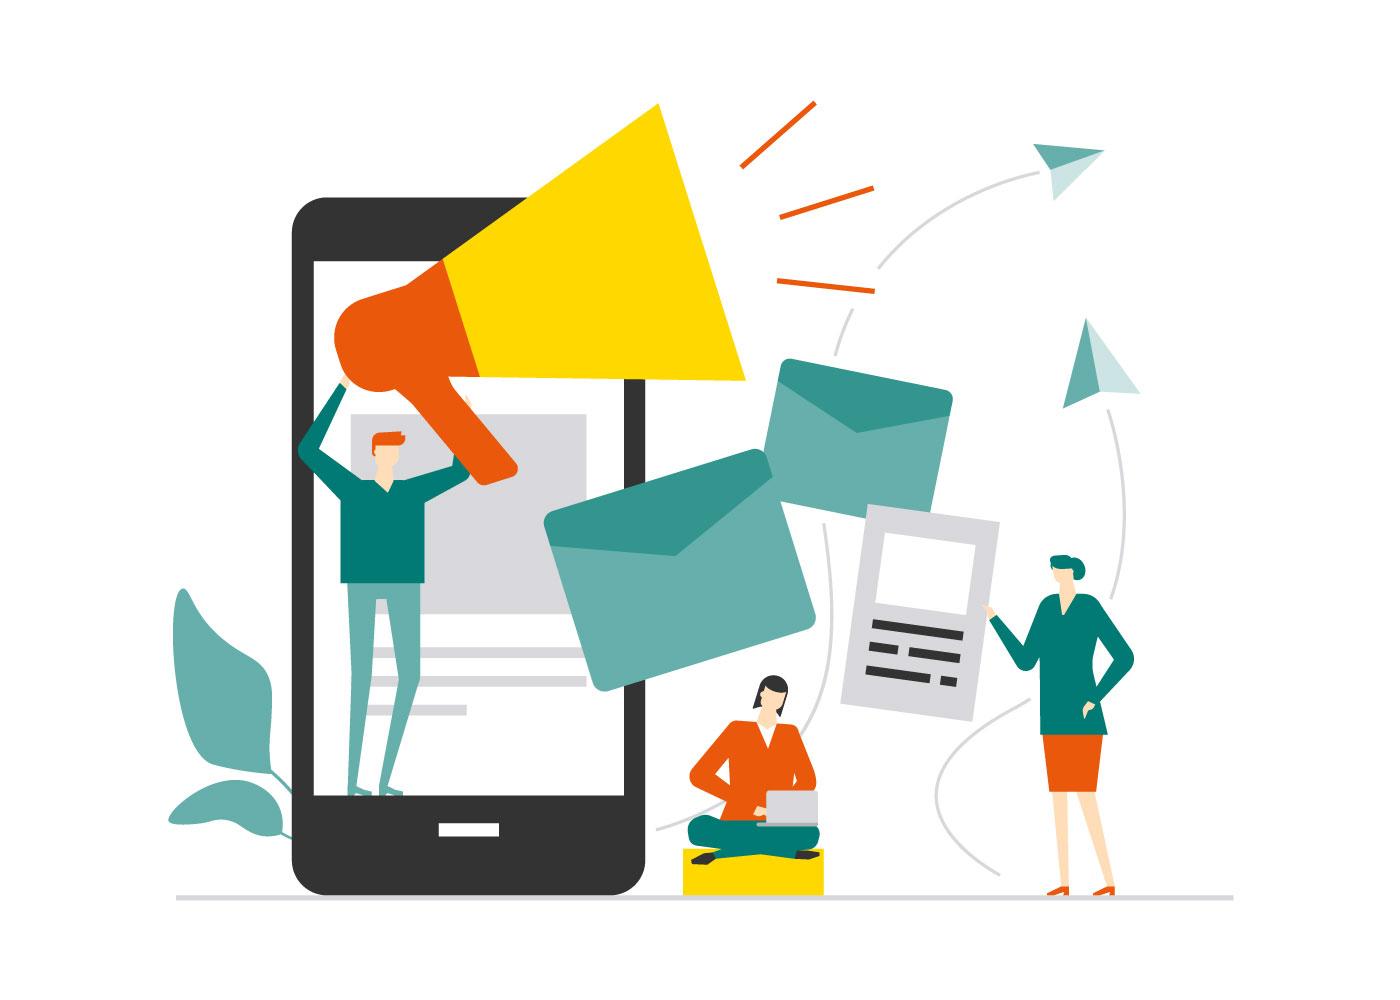 GENERIC-Tjanster-meddelanden-Hero-1400x1000-sms-meddelanden